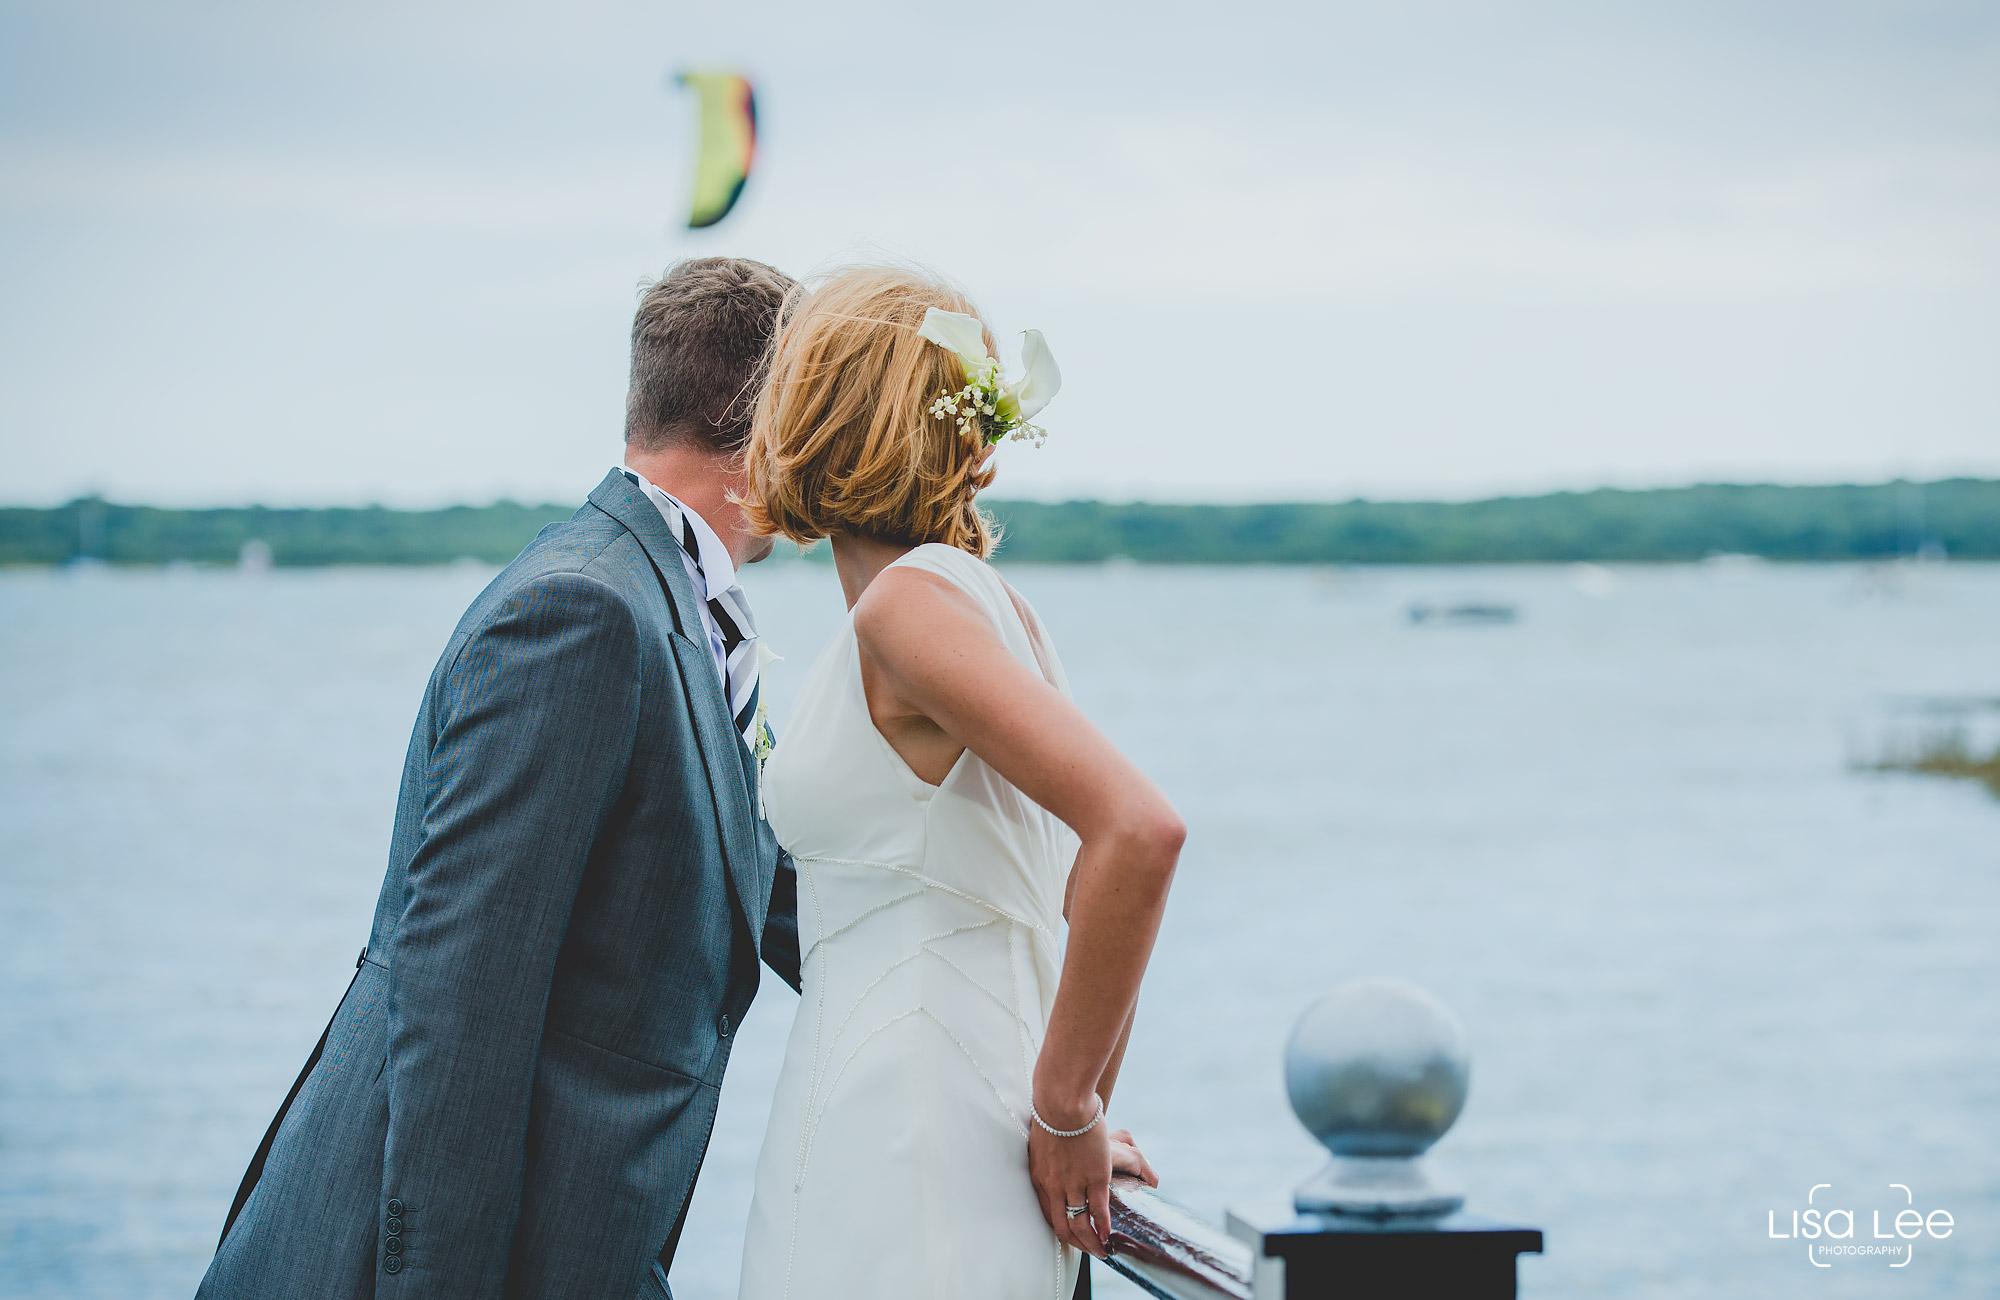 lisa-lee-wedding-photography-christchurch-dorset-bridegroom4.jpg